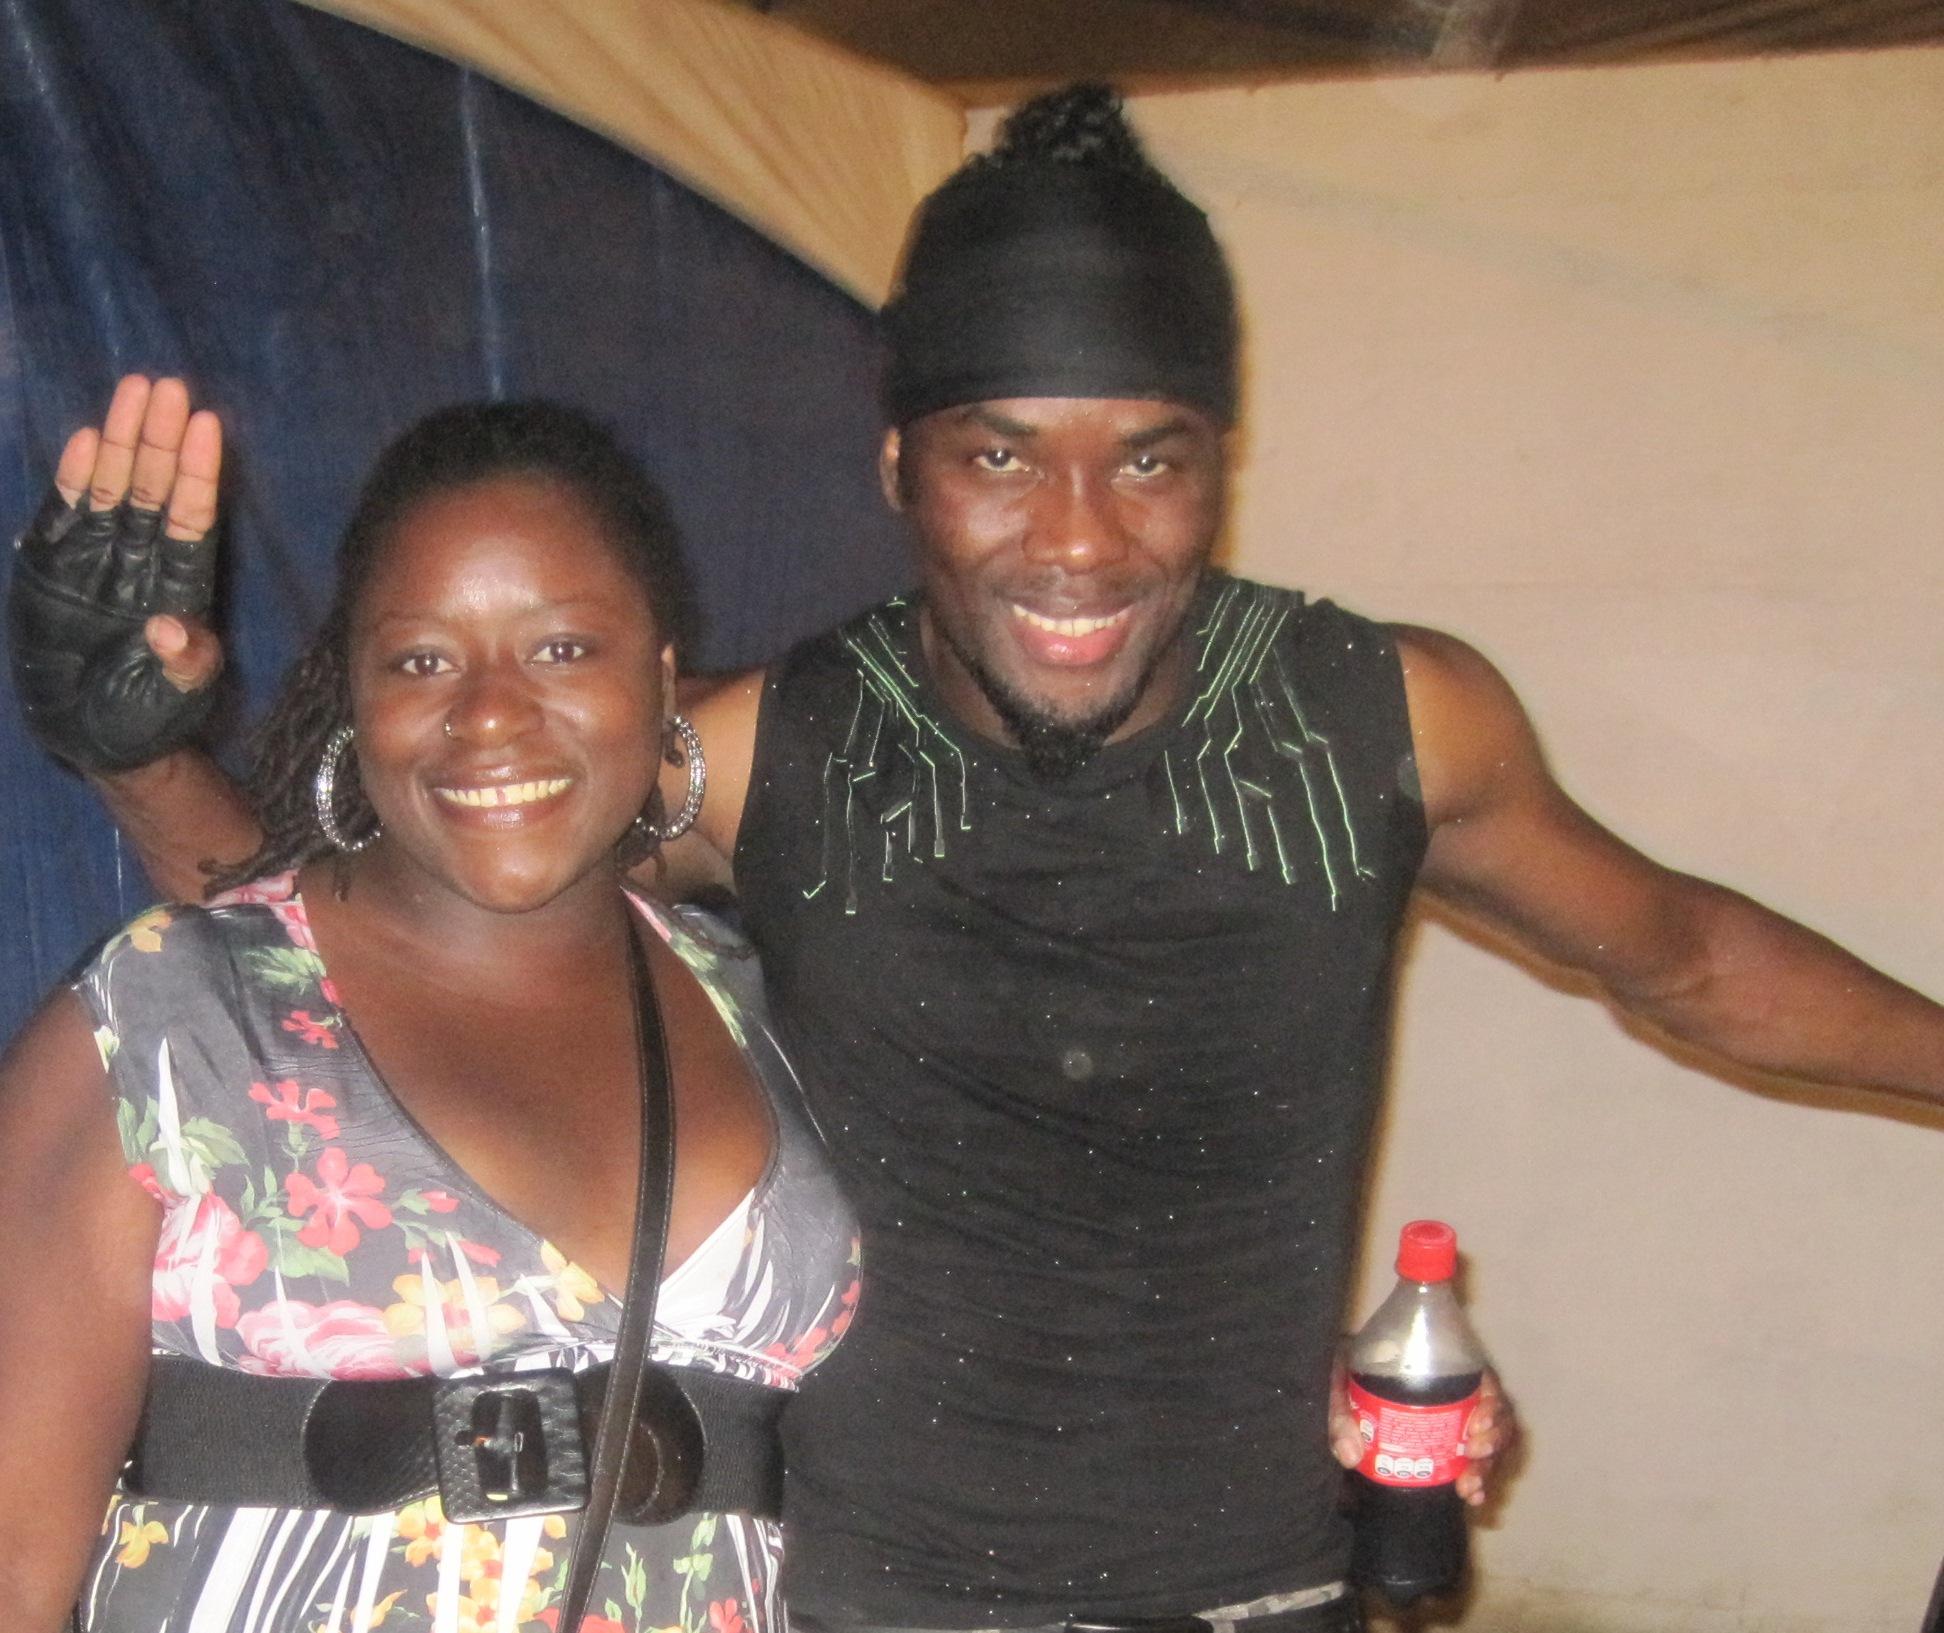 Copy of with Swappi (Trinidad 2012)